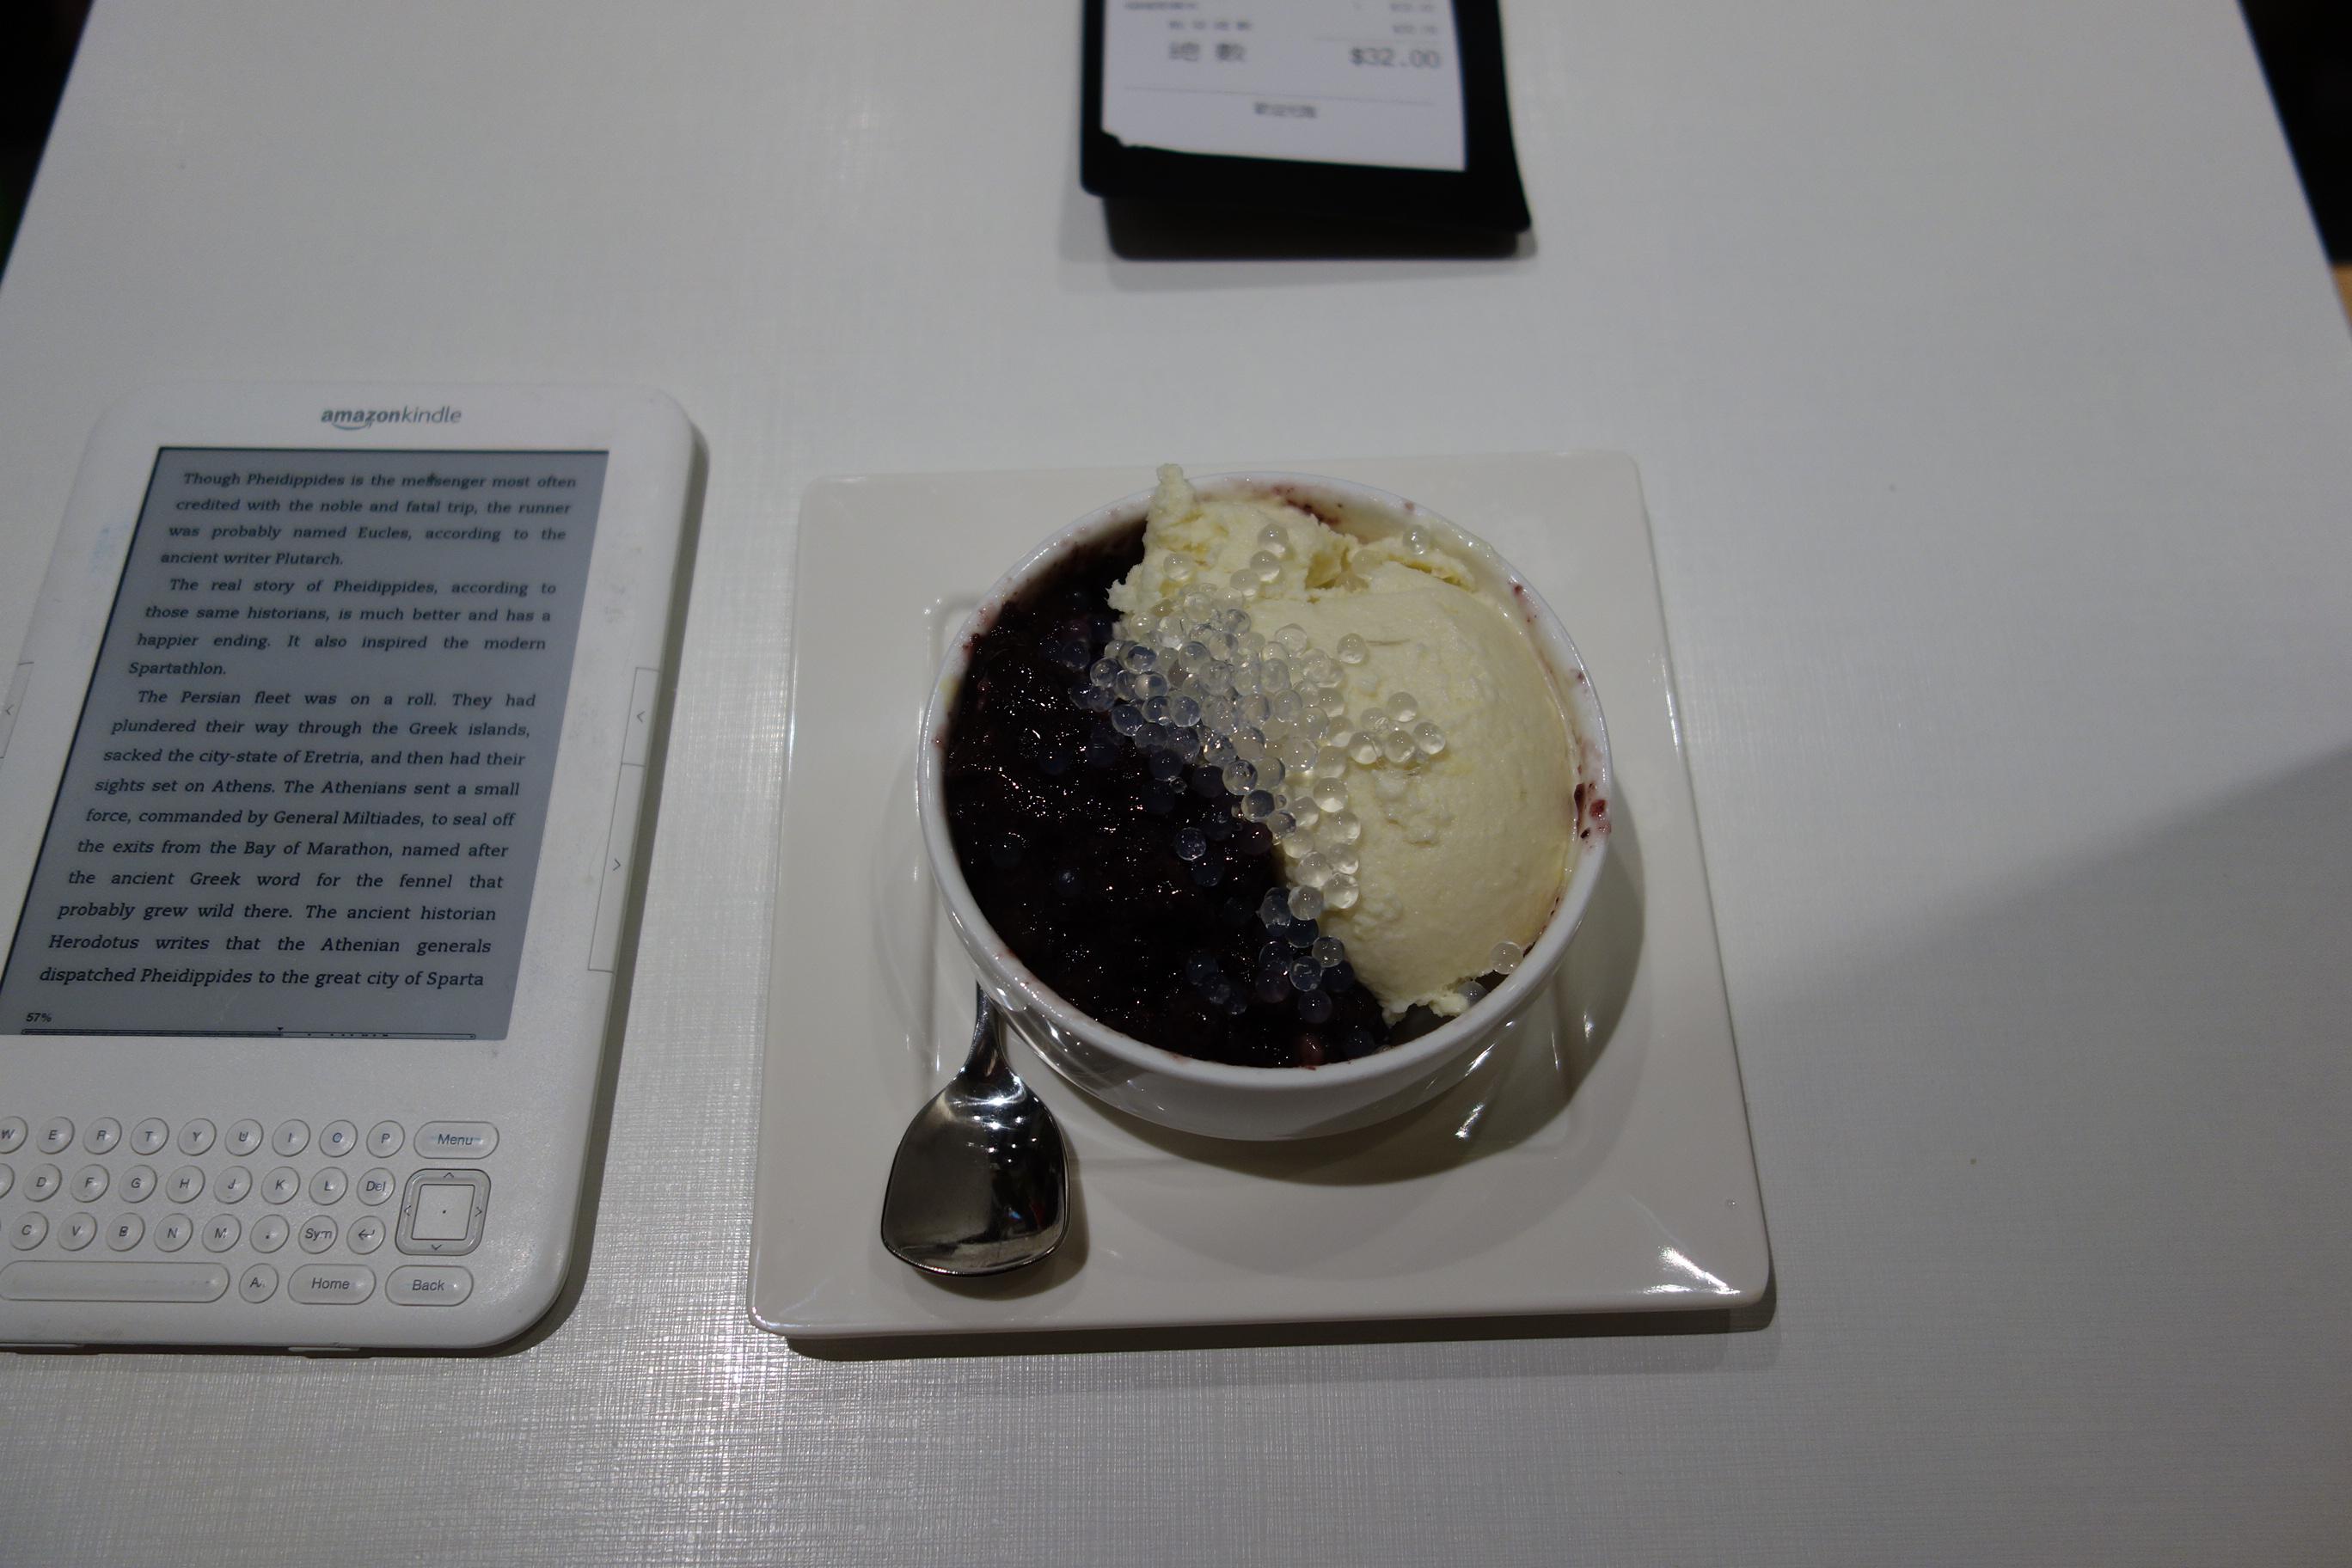 Durian ice cream with stuff